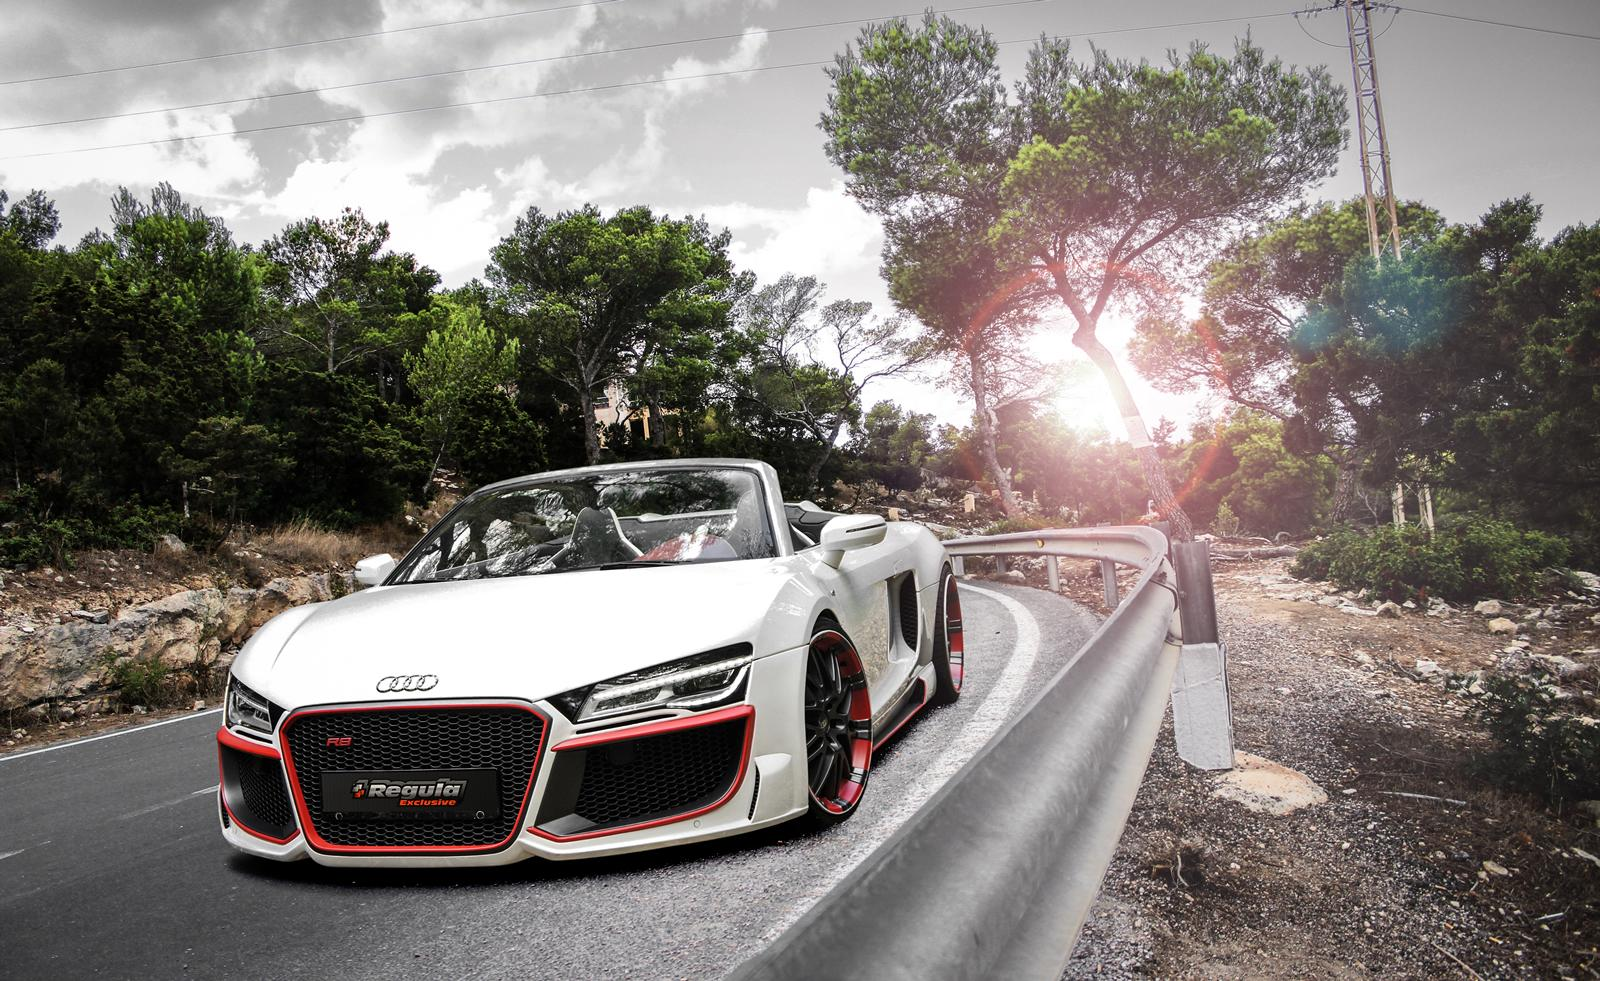 Audi audi r8 spyder v10 : Official: Audi R8 V10 Spyder by REGULA Tuning - GTspirit